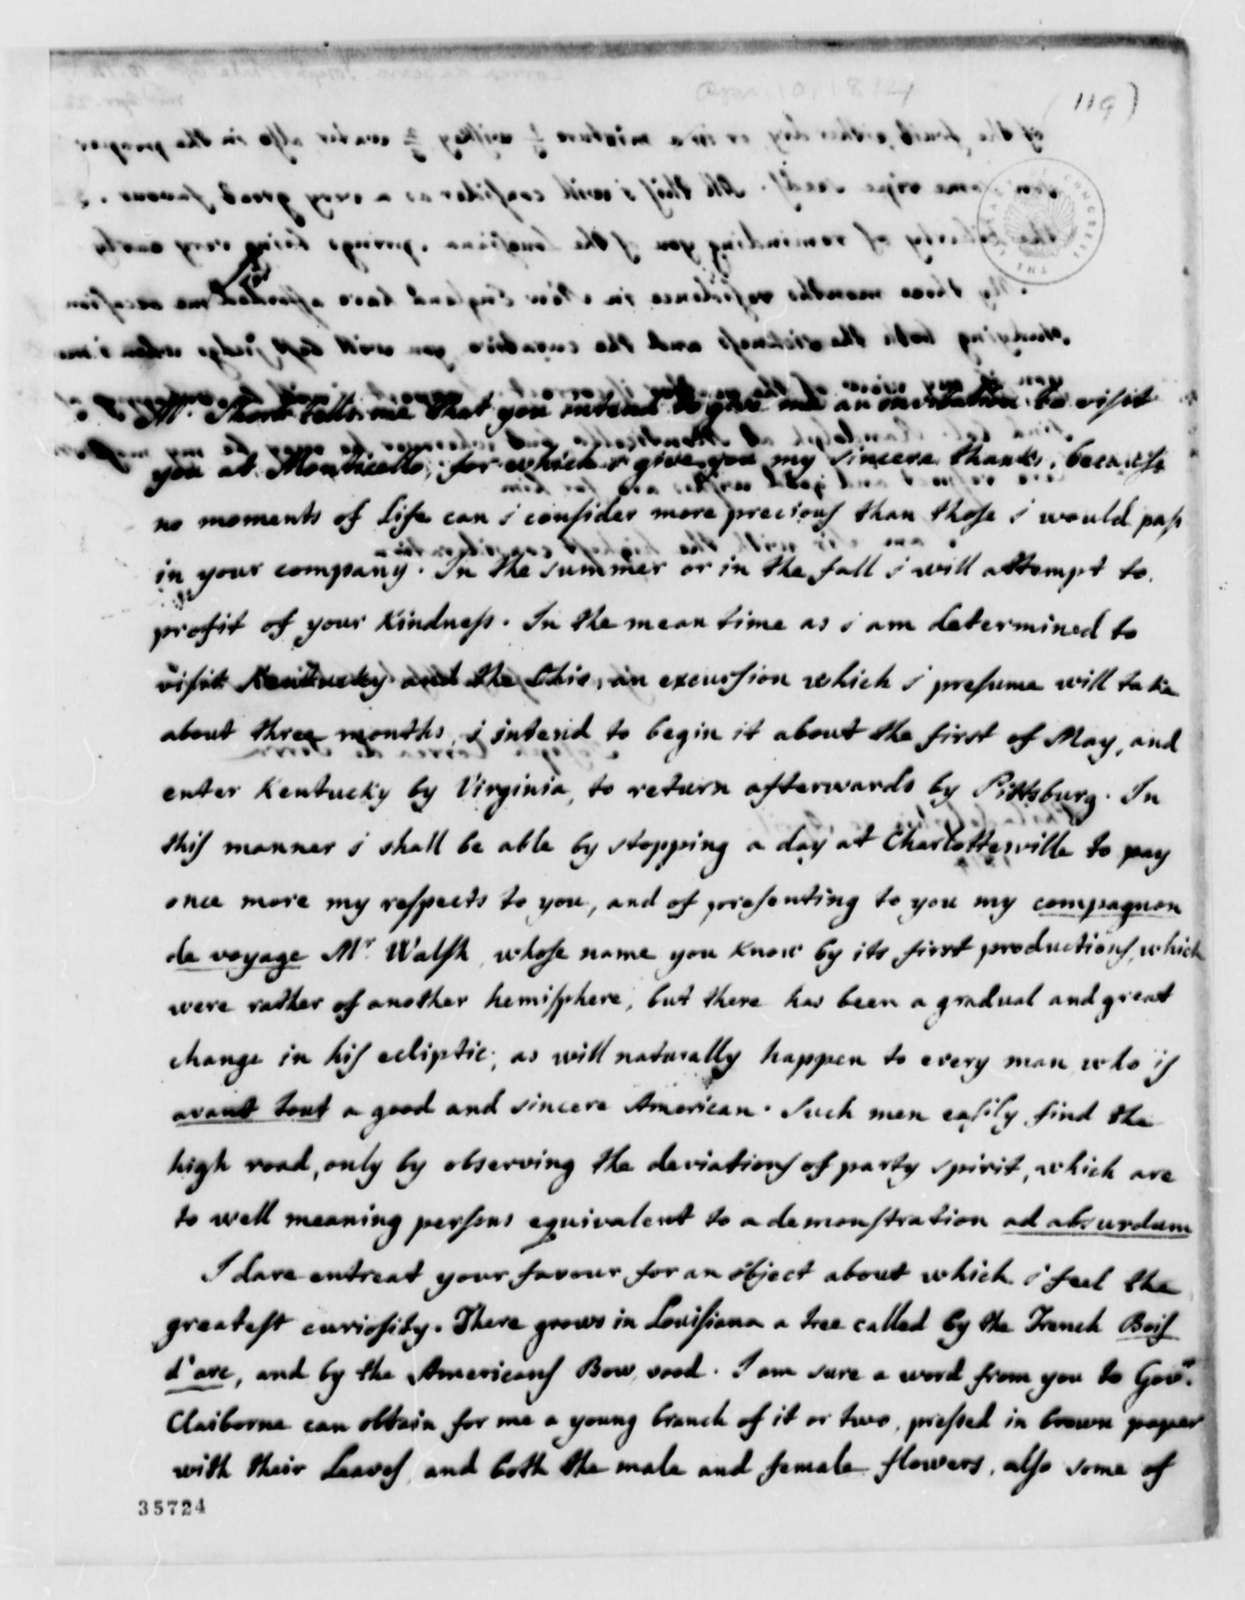 Jose Correa da Serra to Thomas Jefferson, April 10, 1814